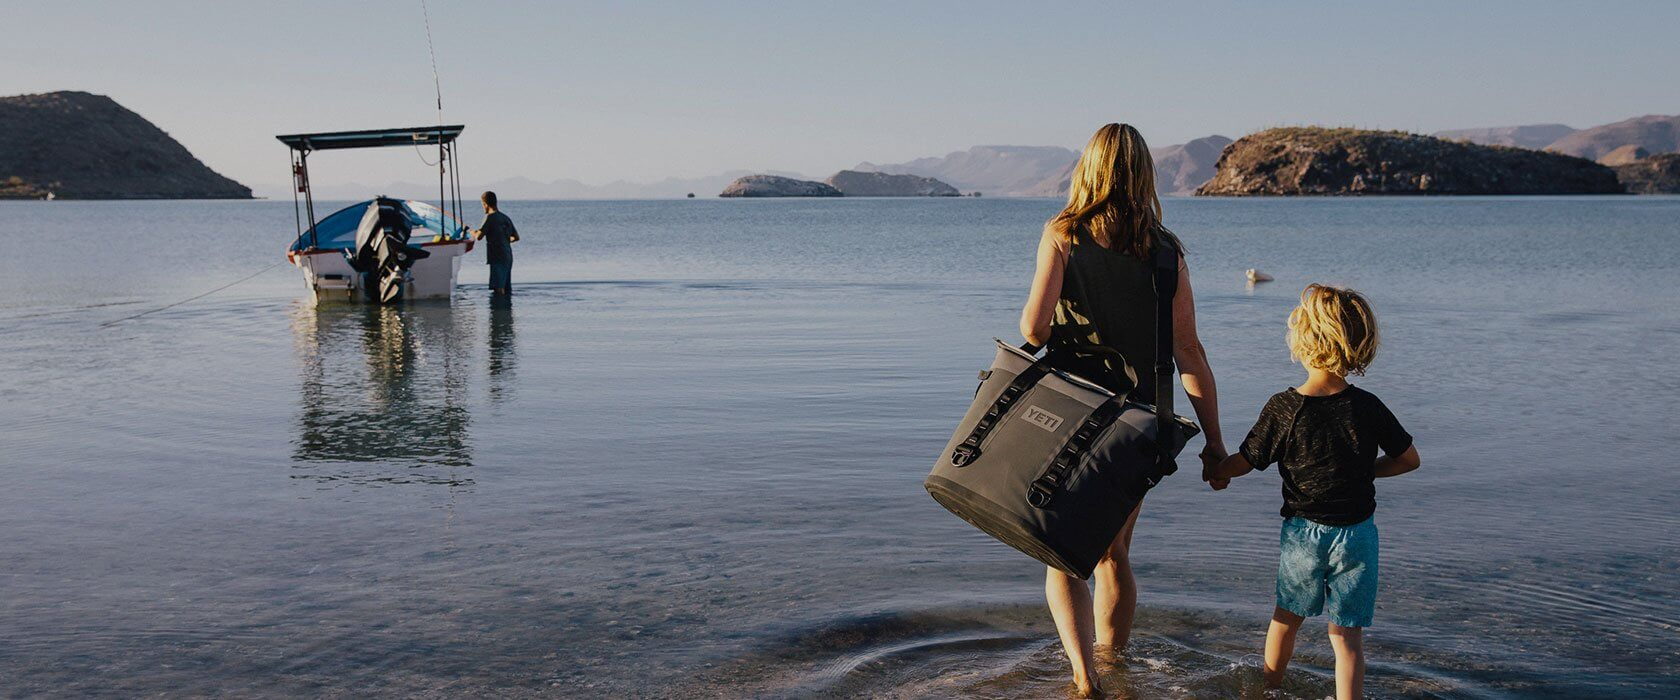 Yeti Hopper M30 At The Beach